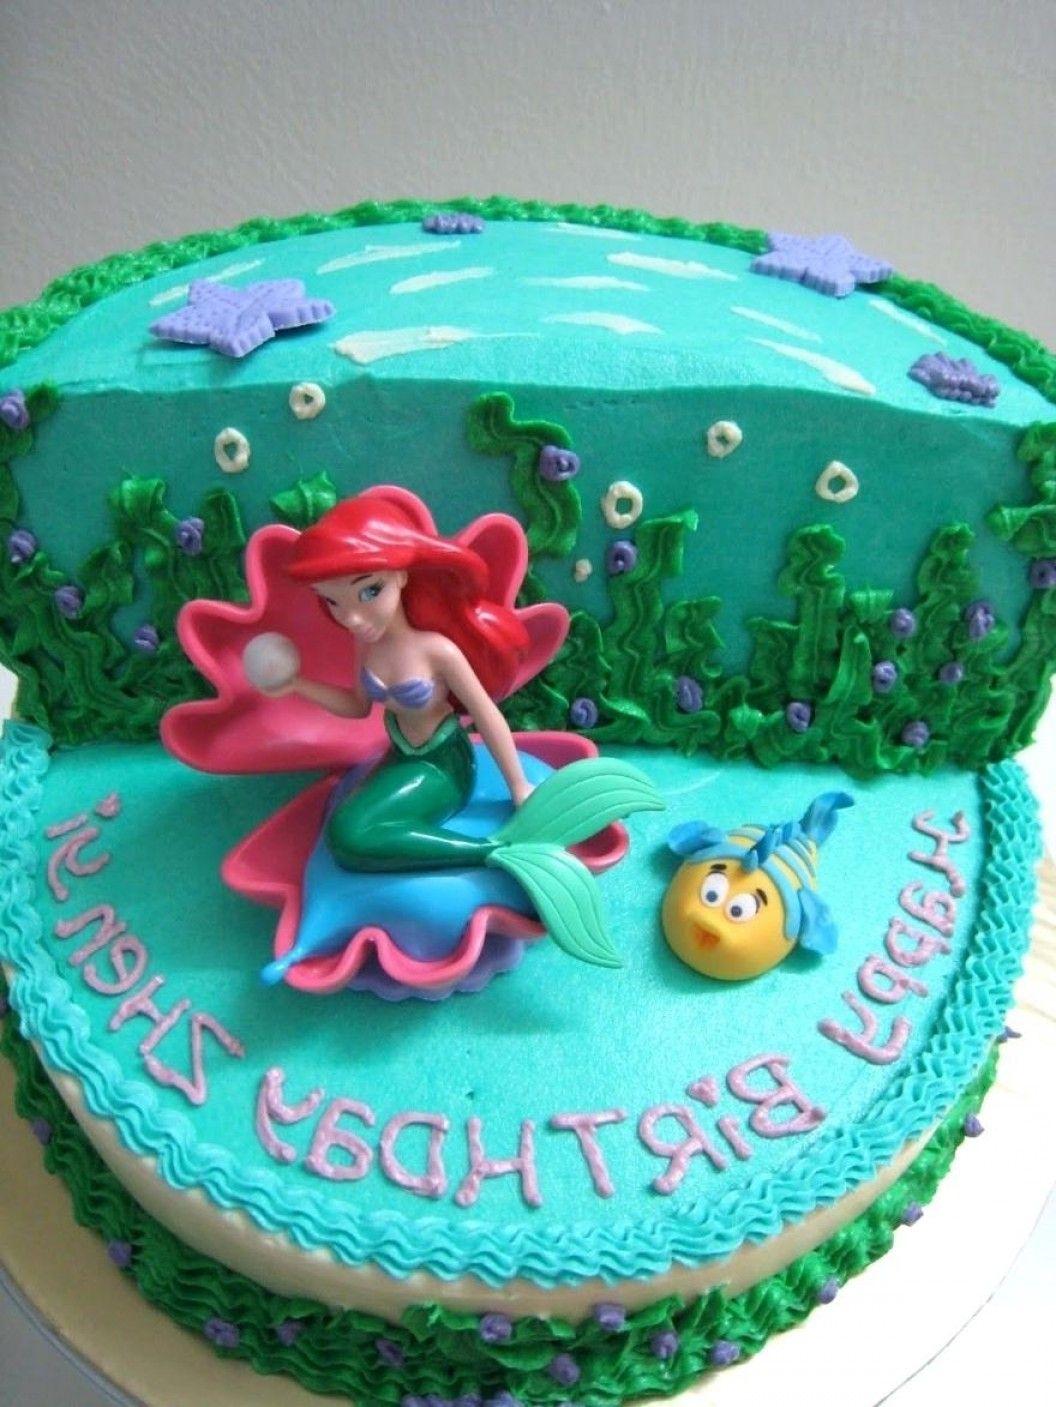 Walmart Cake Designs : walmart, designs, Photo, Walmart, Birthday, Bakery, Cakes, Walma…, Cakes,